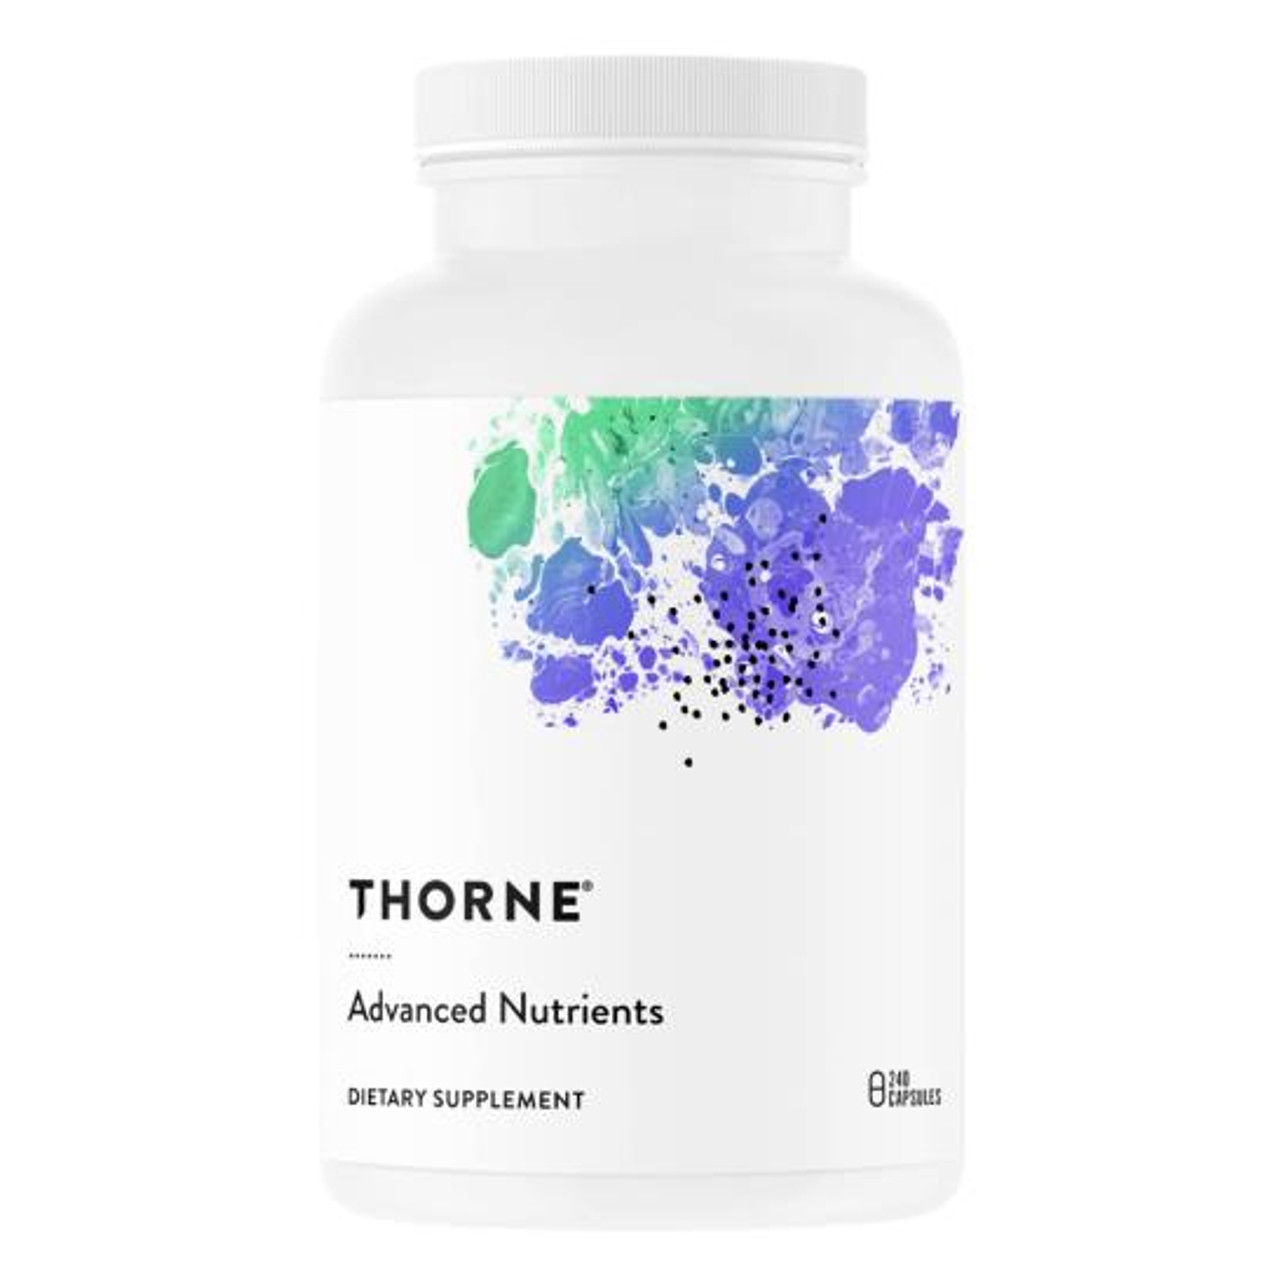 Advanced Nutrients 240 Caps